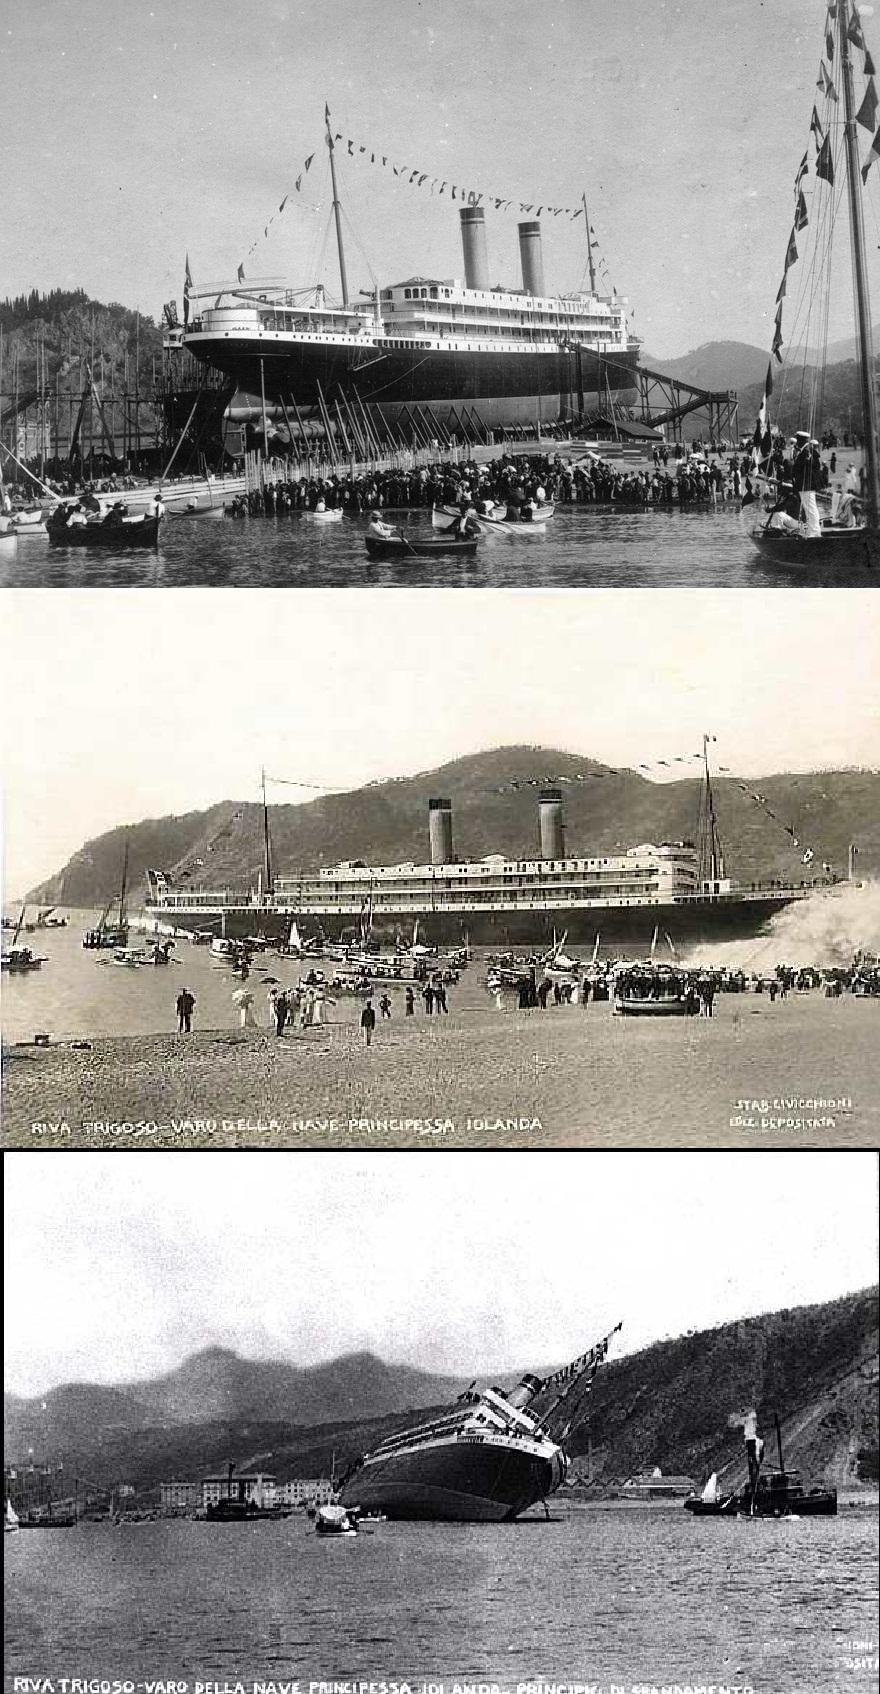 1907_-_ss_principessa_jolanda.jpg